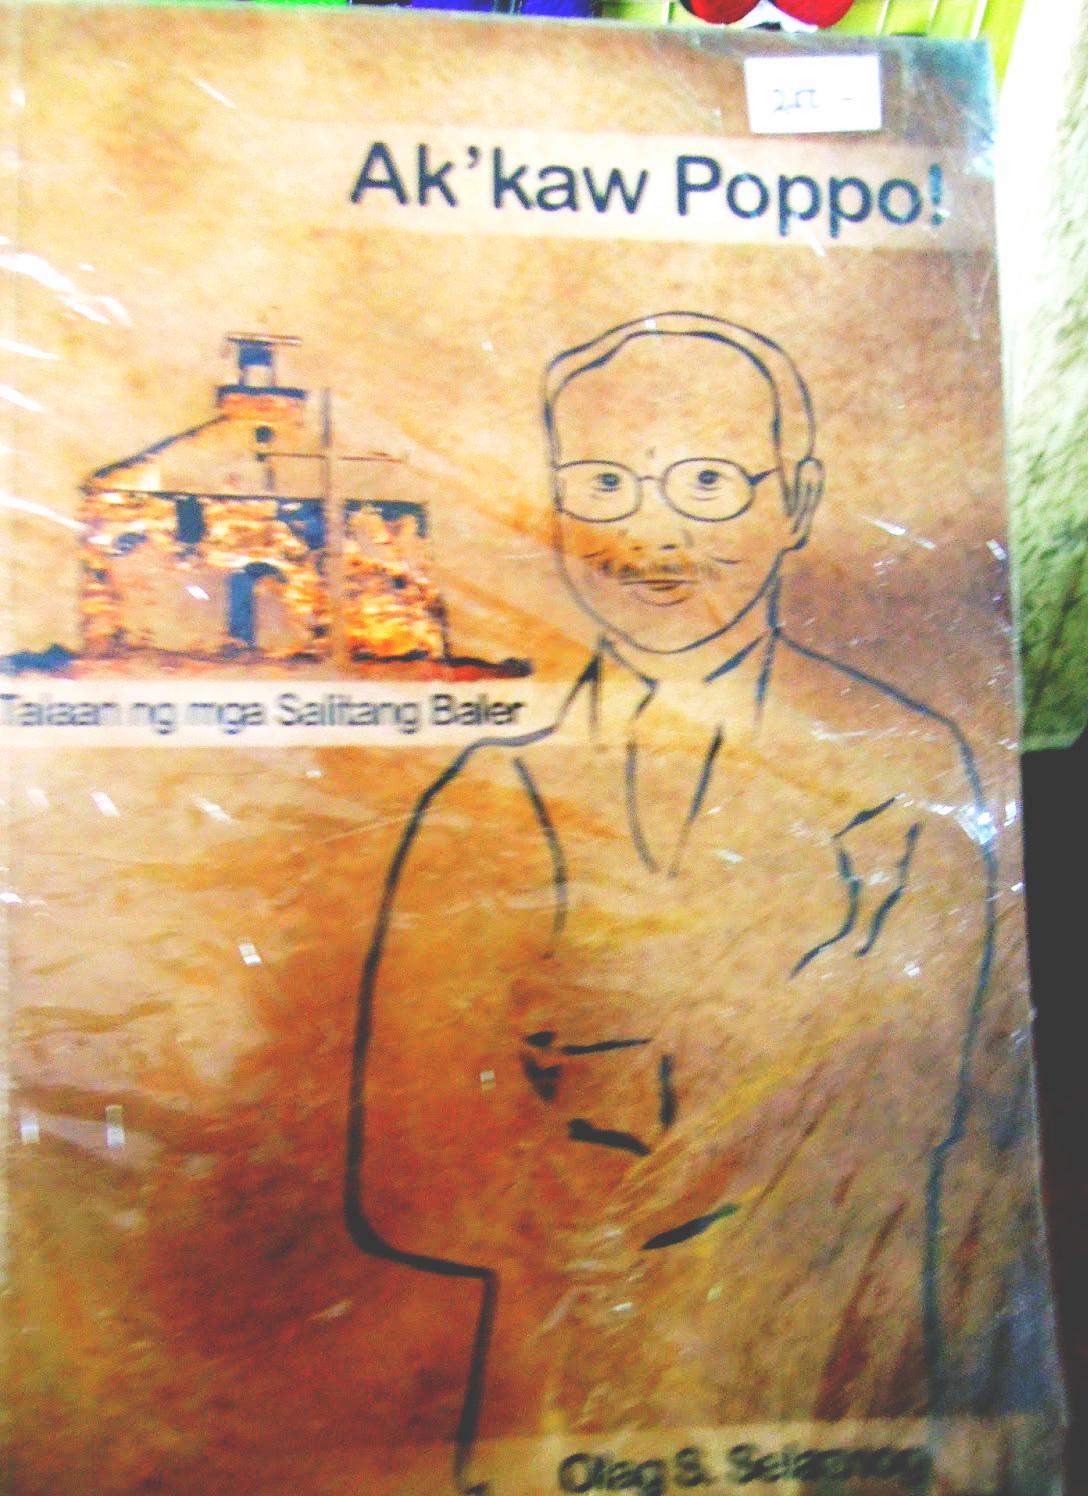 mura-book-baler-ak'kaw-poppo